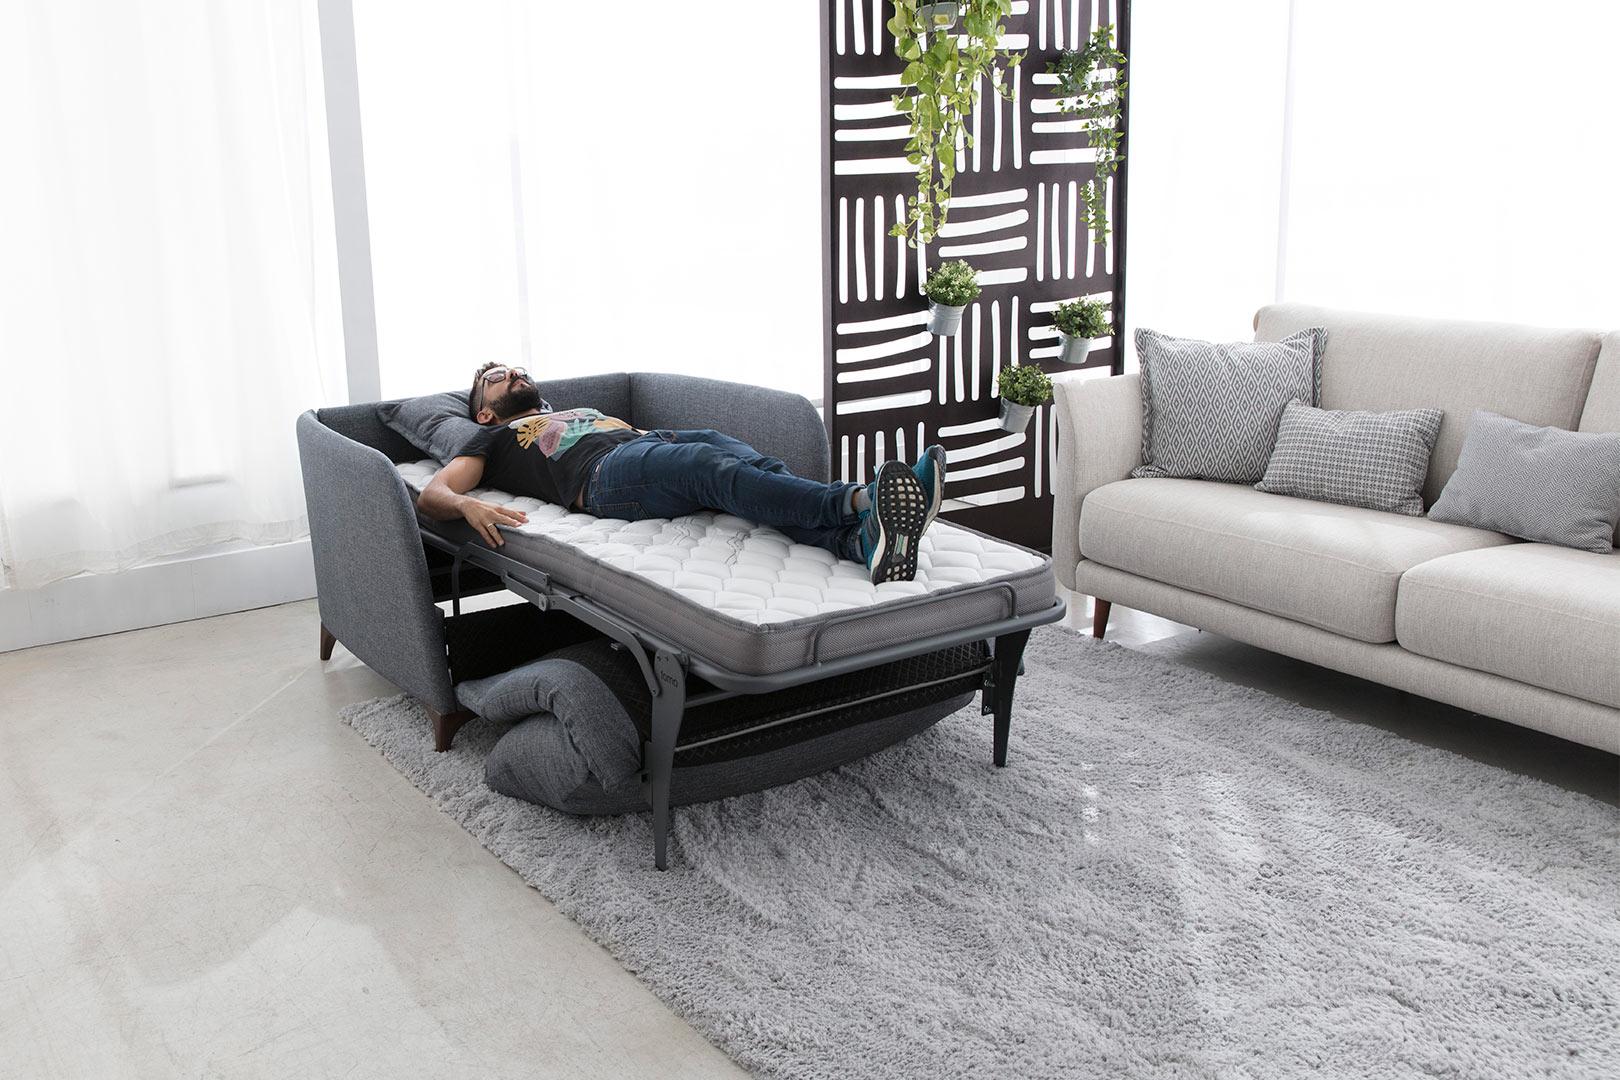 Gala sillón cama 2020 04